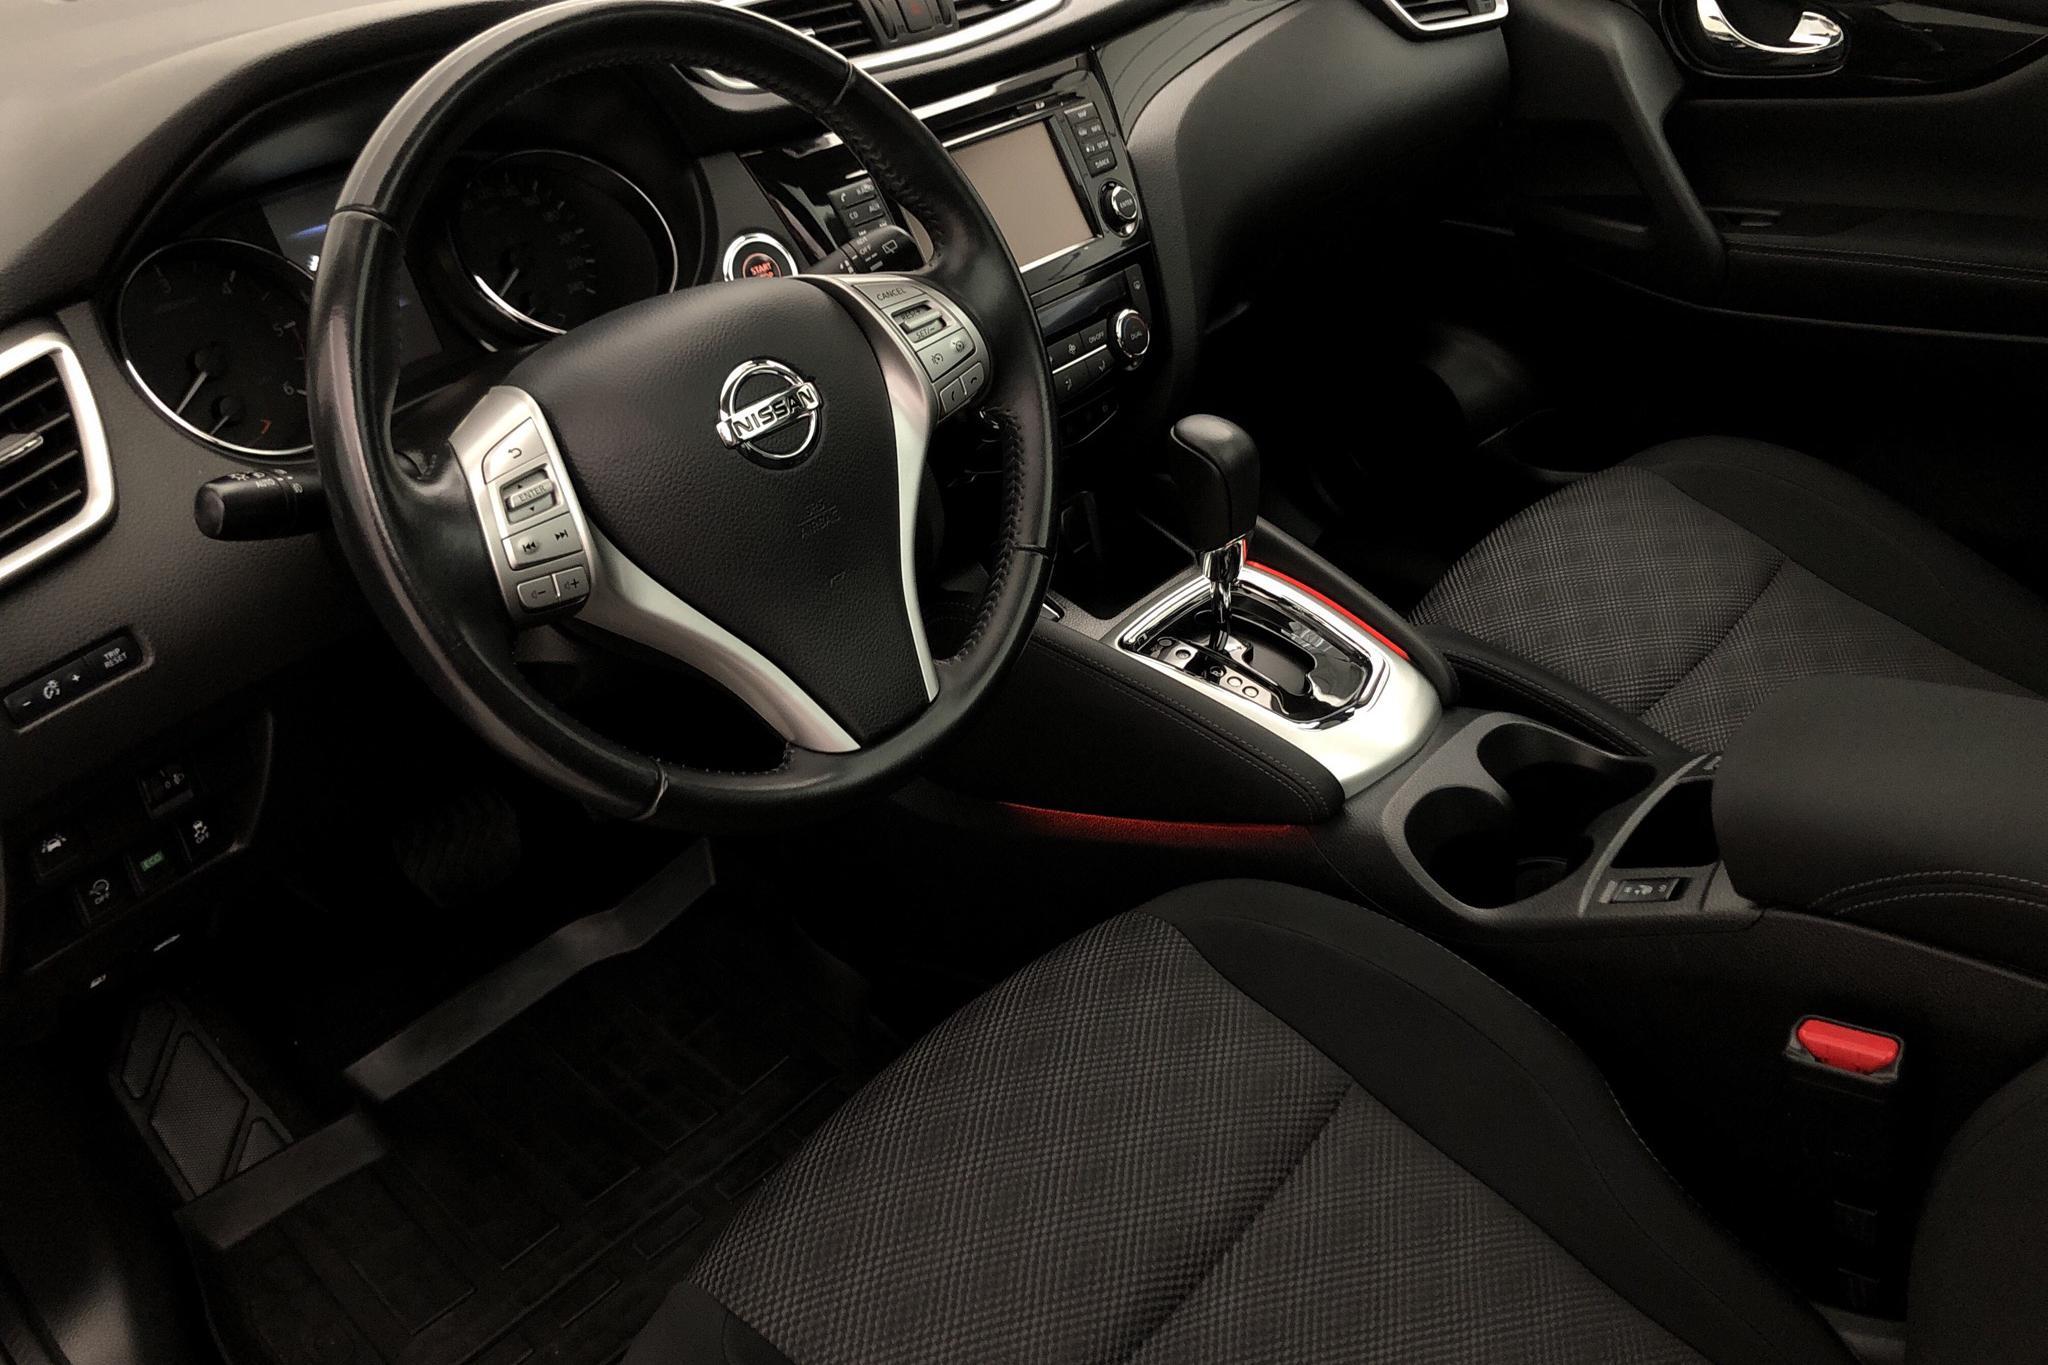 Nissan Qashqai 1.6 dCi (130hk) - 4 899 mil - Automat - svart - 2017